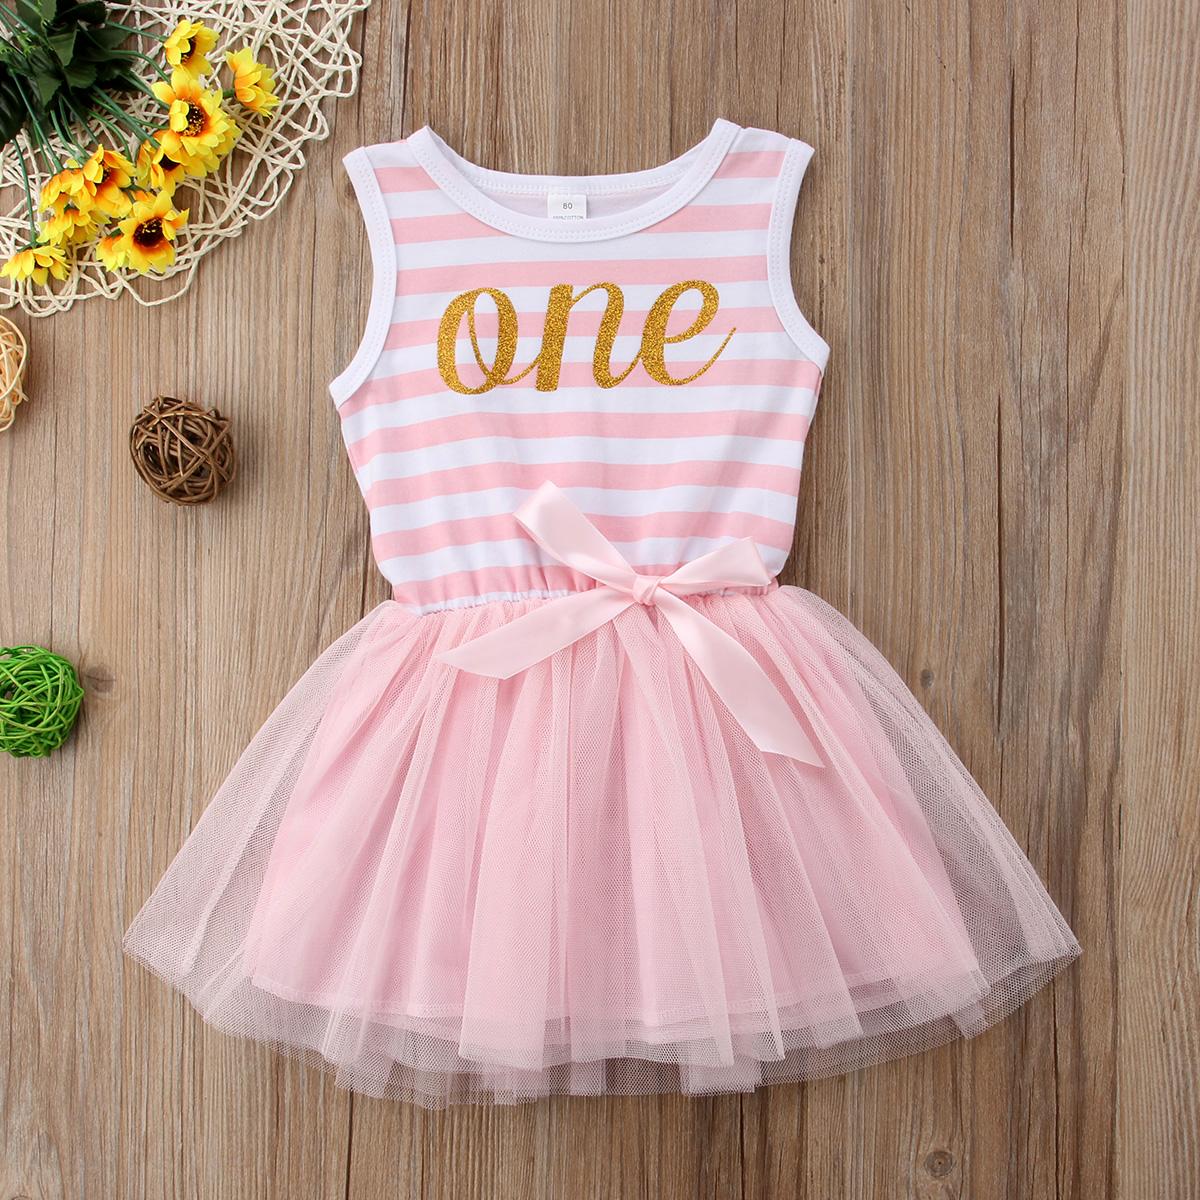 6db6e9f048 2018 NEW Newborn Baby Girls First 1st Birthday Tutu Tulle Dress Toddler  Dresses SUMMER stripe pink purple lovely stylish CH